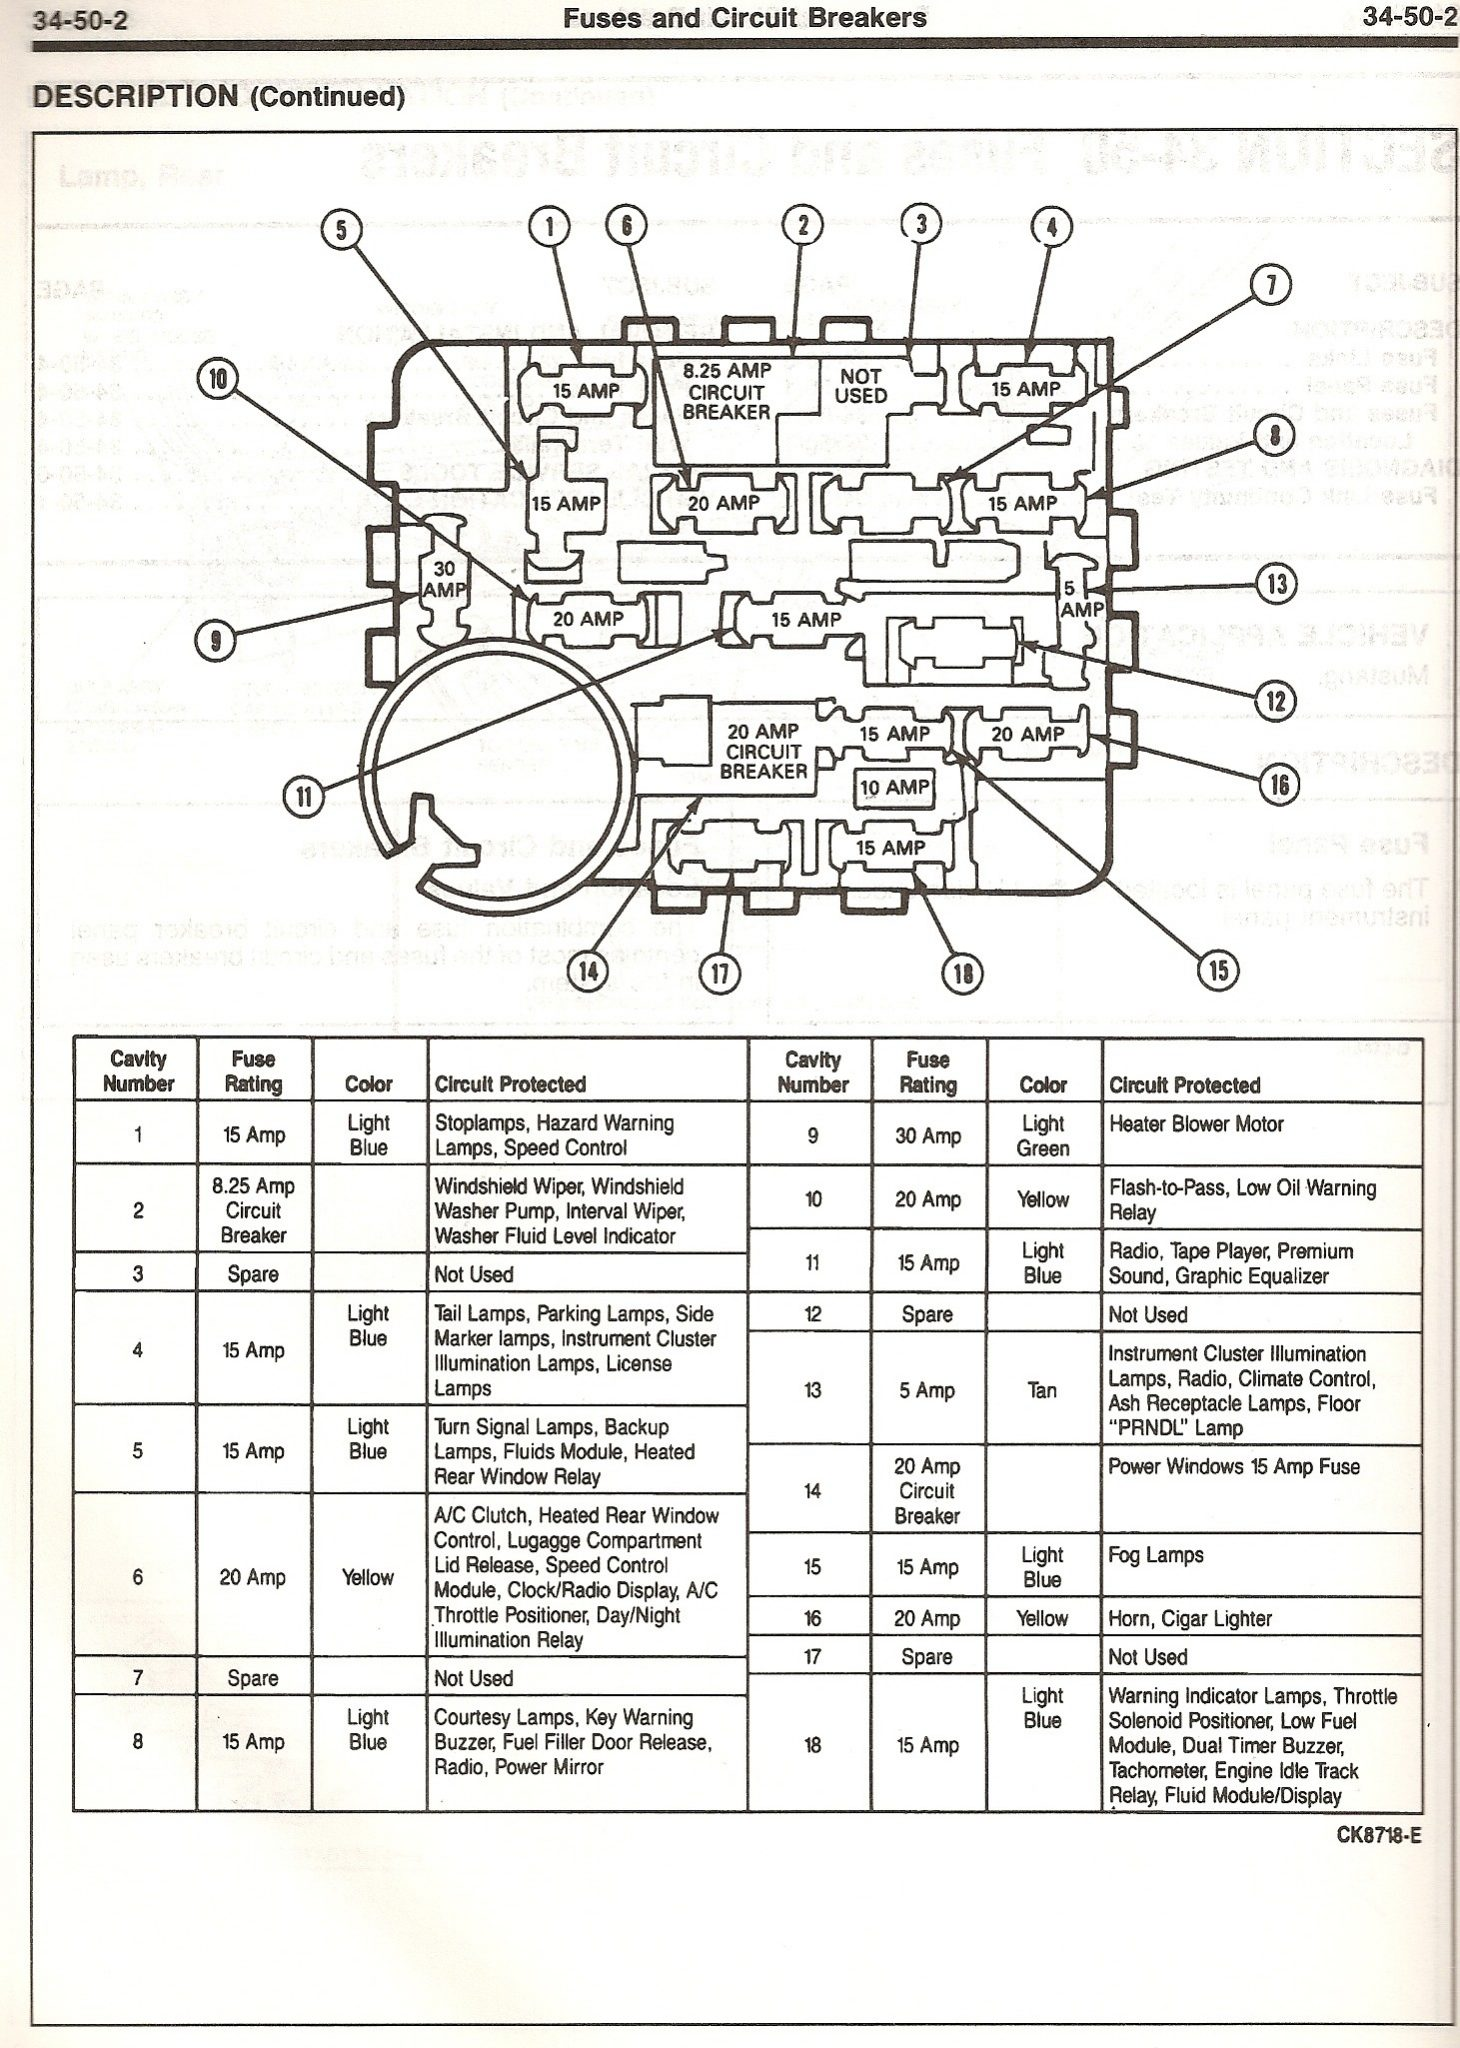 1990 Ford Bronco 2 Fuse Box Diagram Wiring Diagram Productive Productive Zaafran It